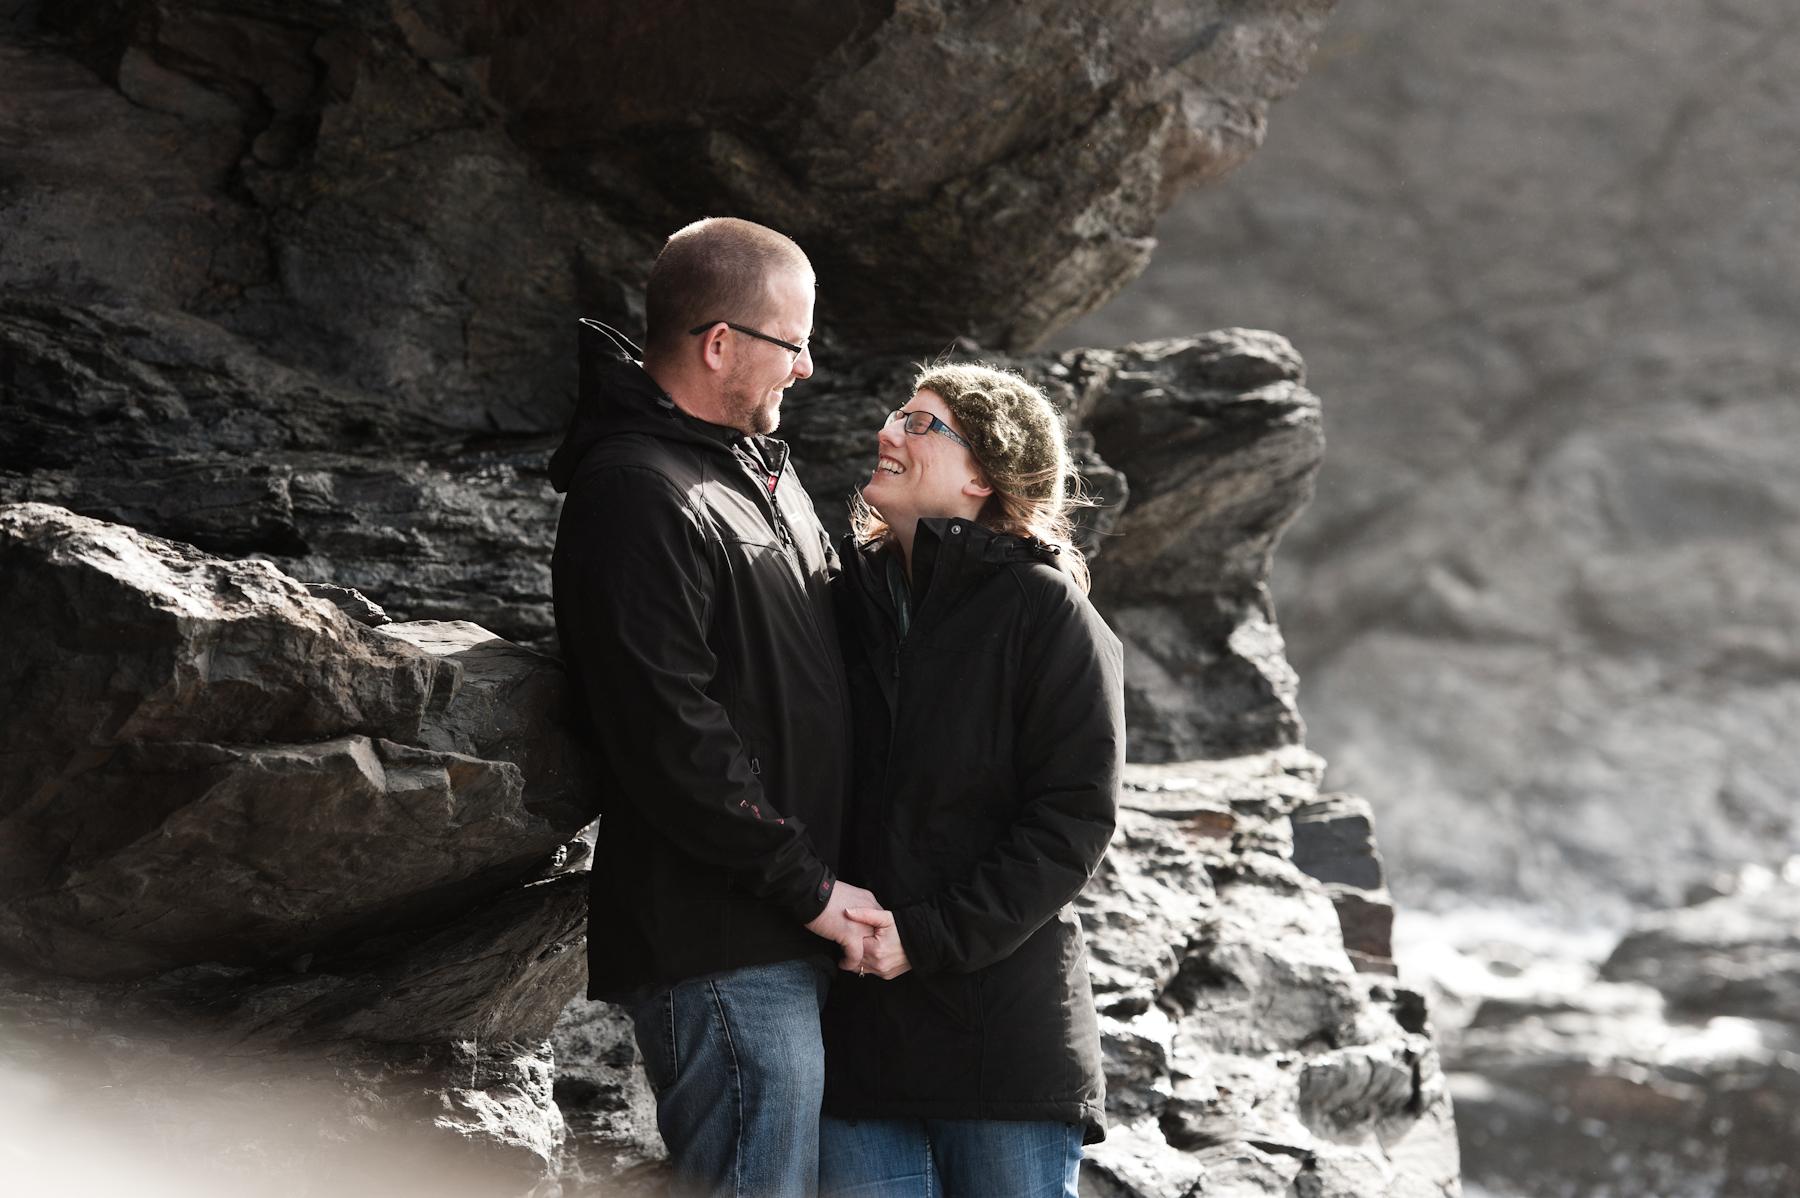 cornwall wedding test shoot (24 of 29).jpg